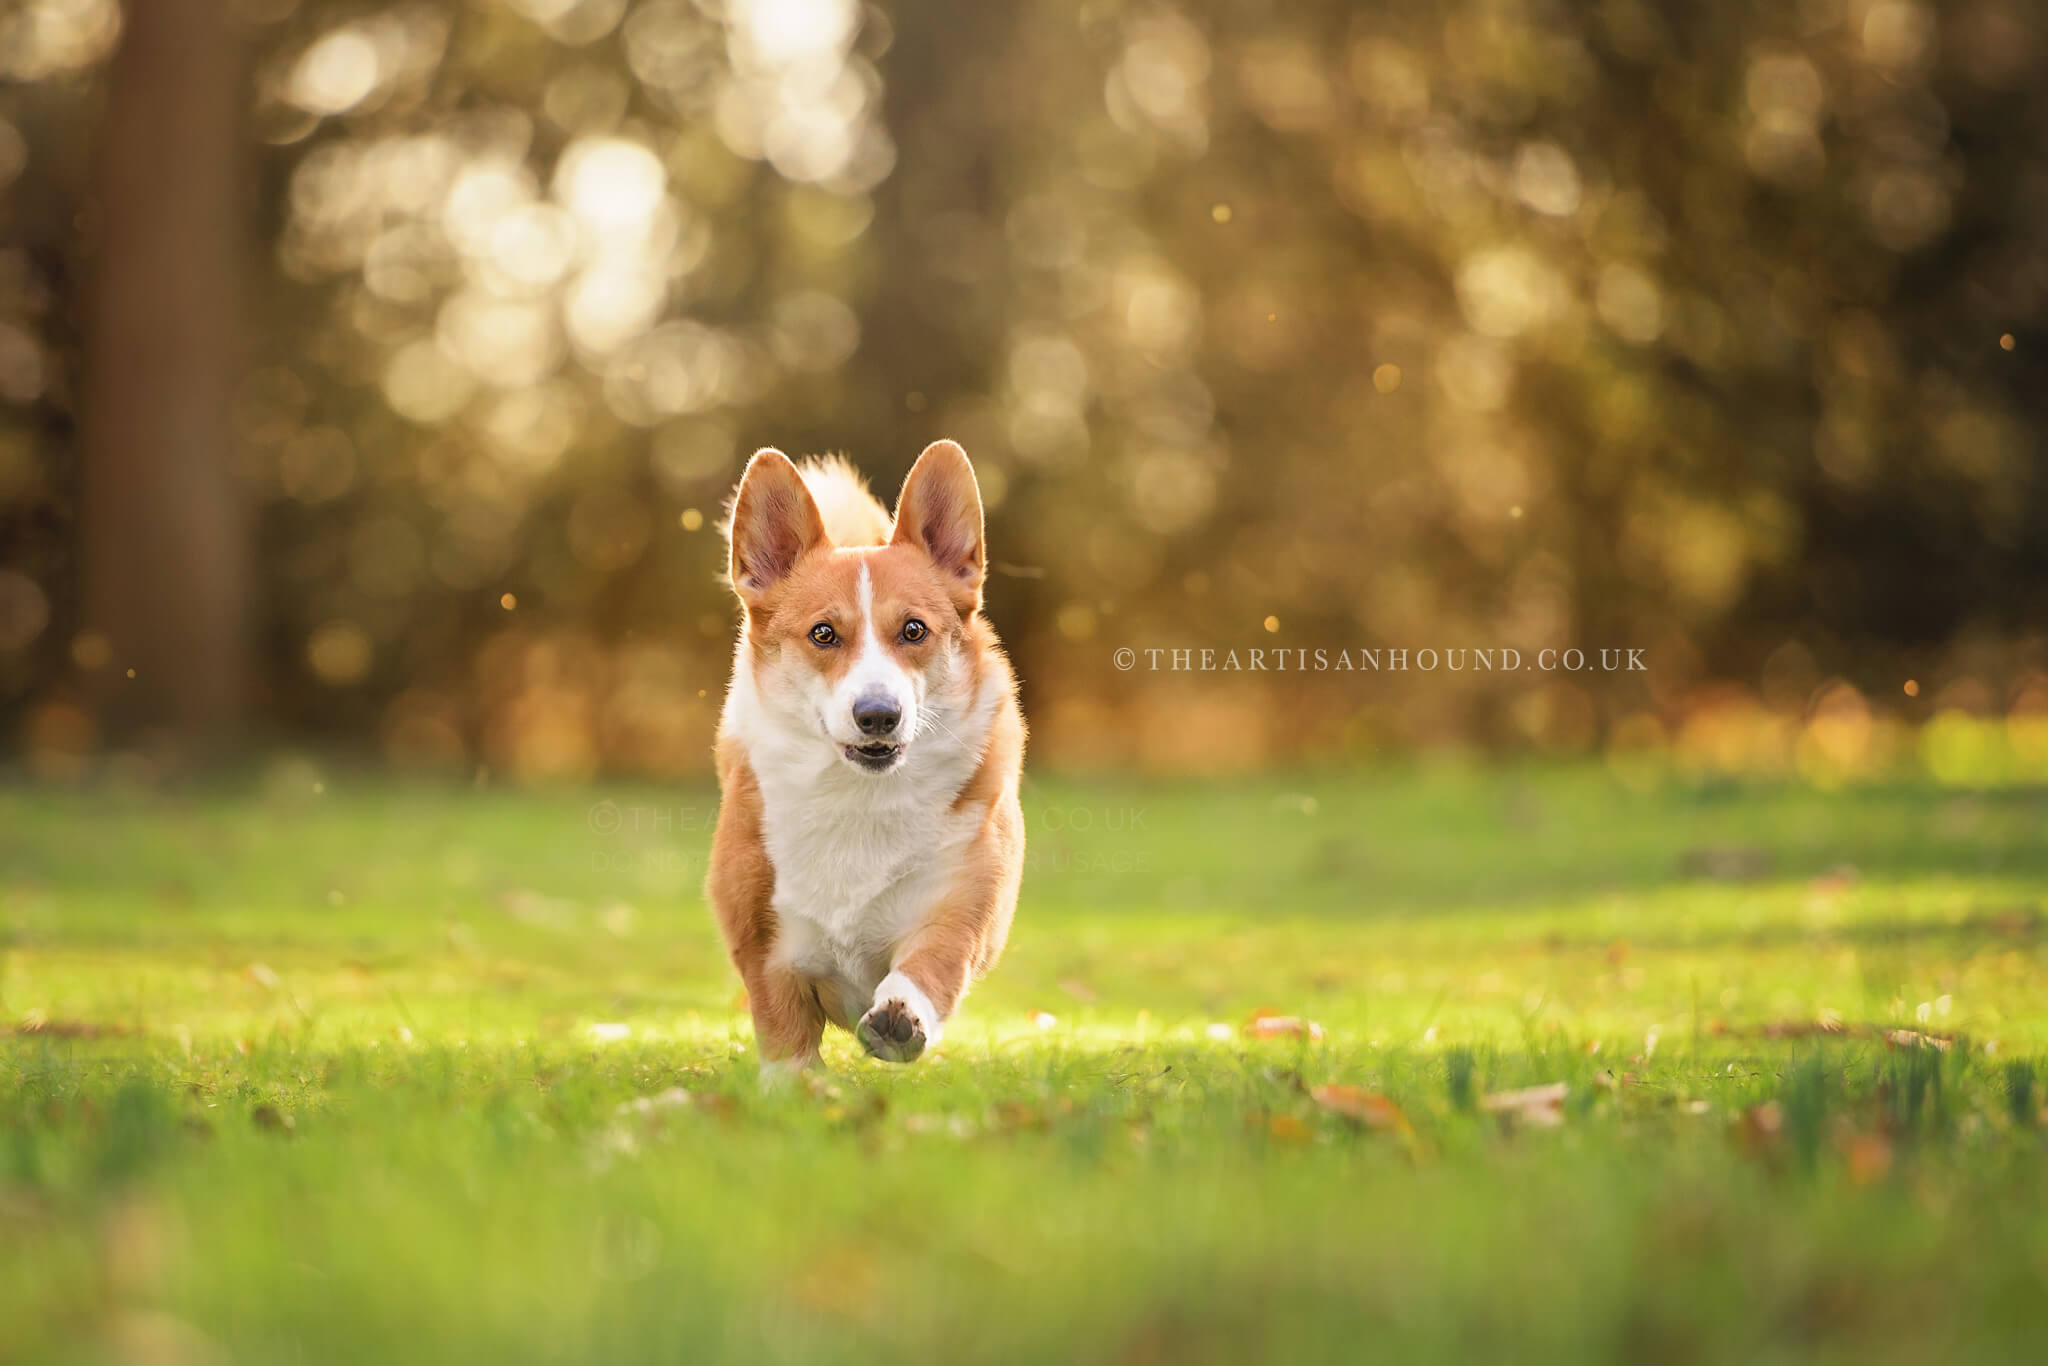 Corgi-dog-running-across-field